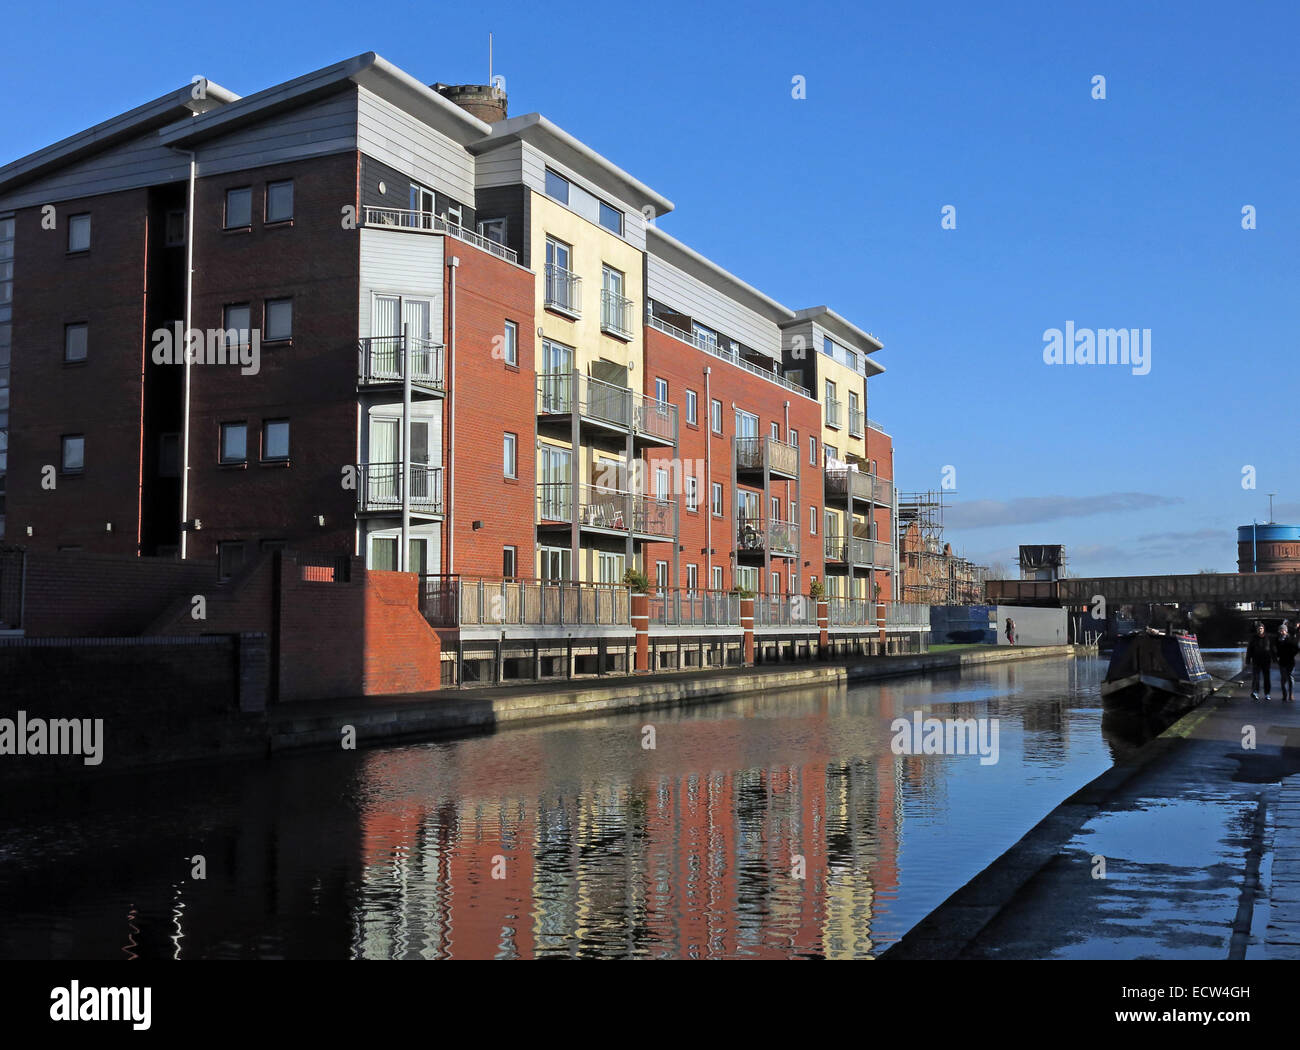 UK,GB,Great,Britain,British,reflection,reflective,new,with,old,blue,sky,GoTonySmith,City Centre,City,Centre,@hotpixUK